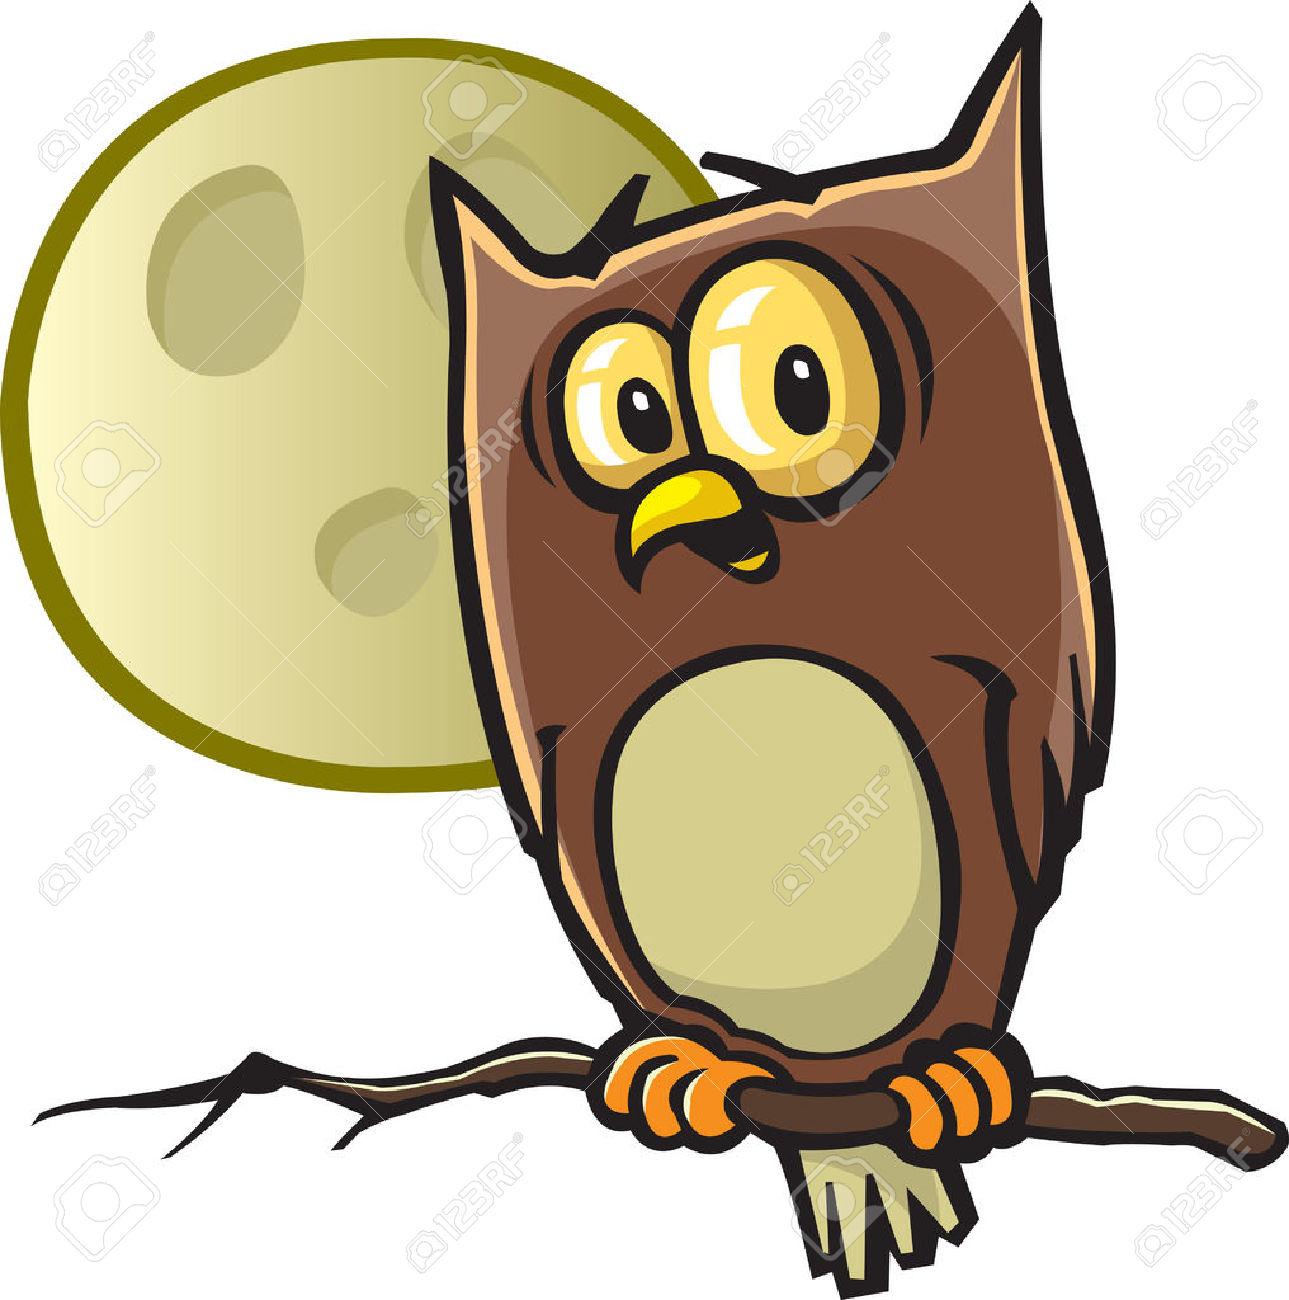 1289x1300 Horned Owl Clipart Cartoon Halloween